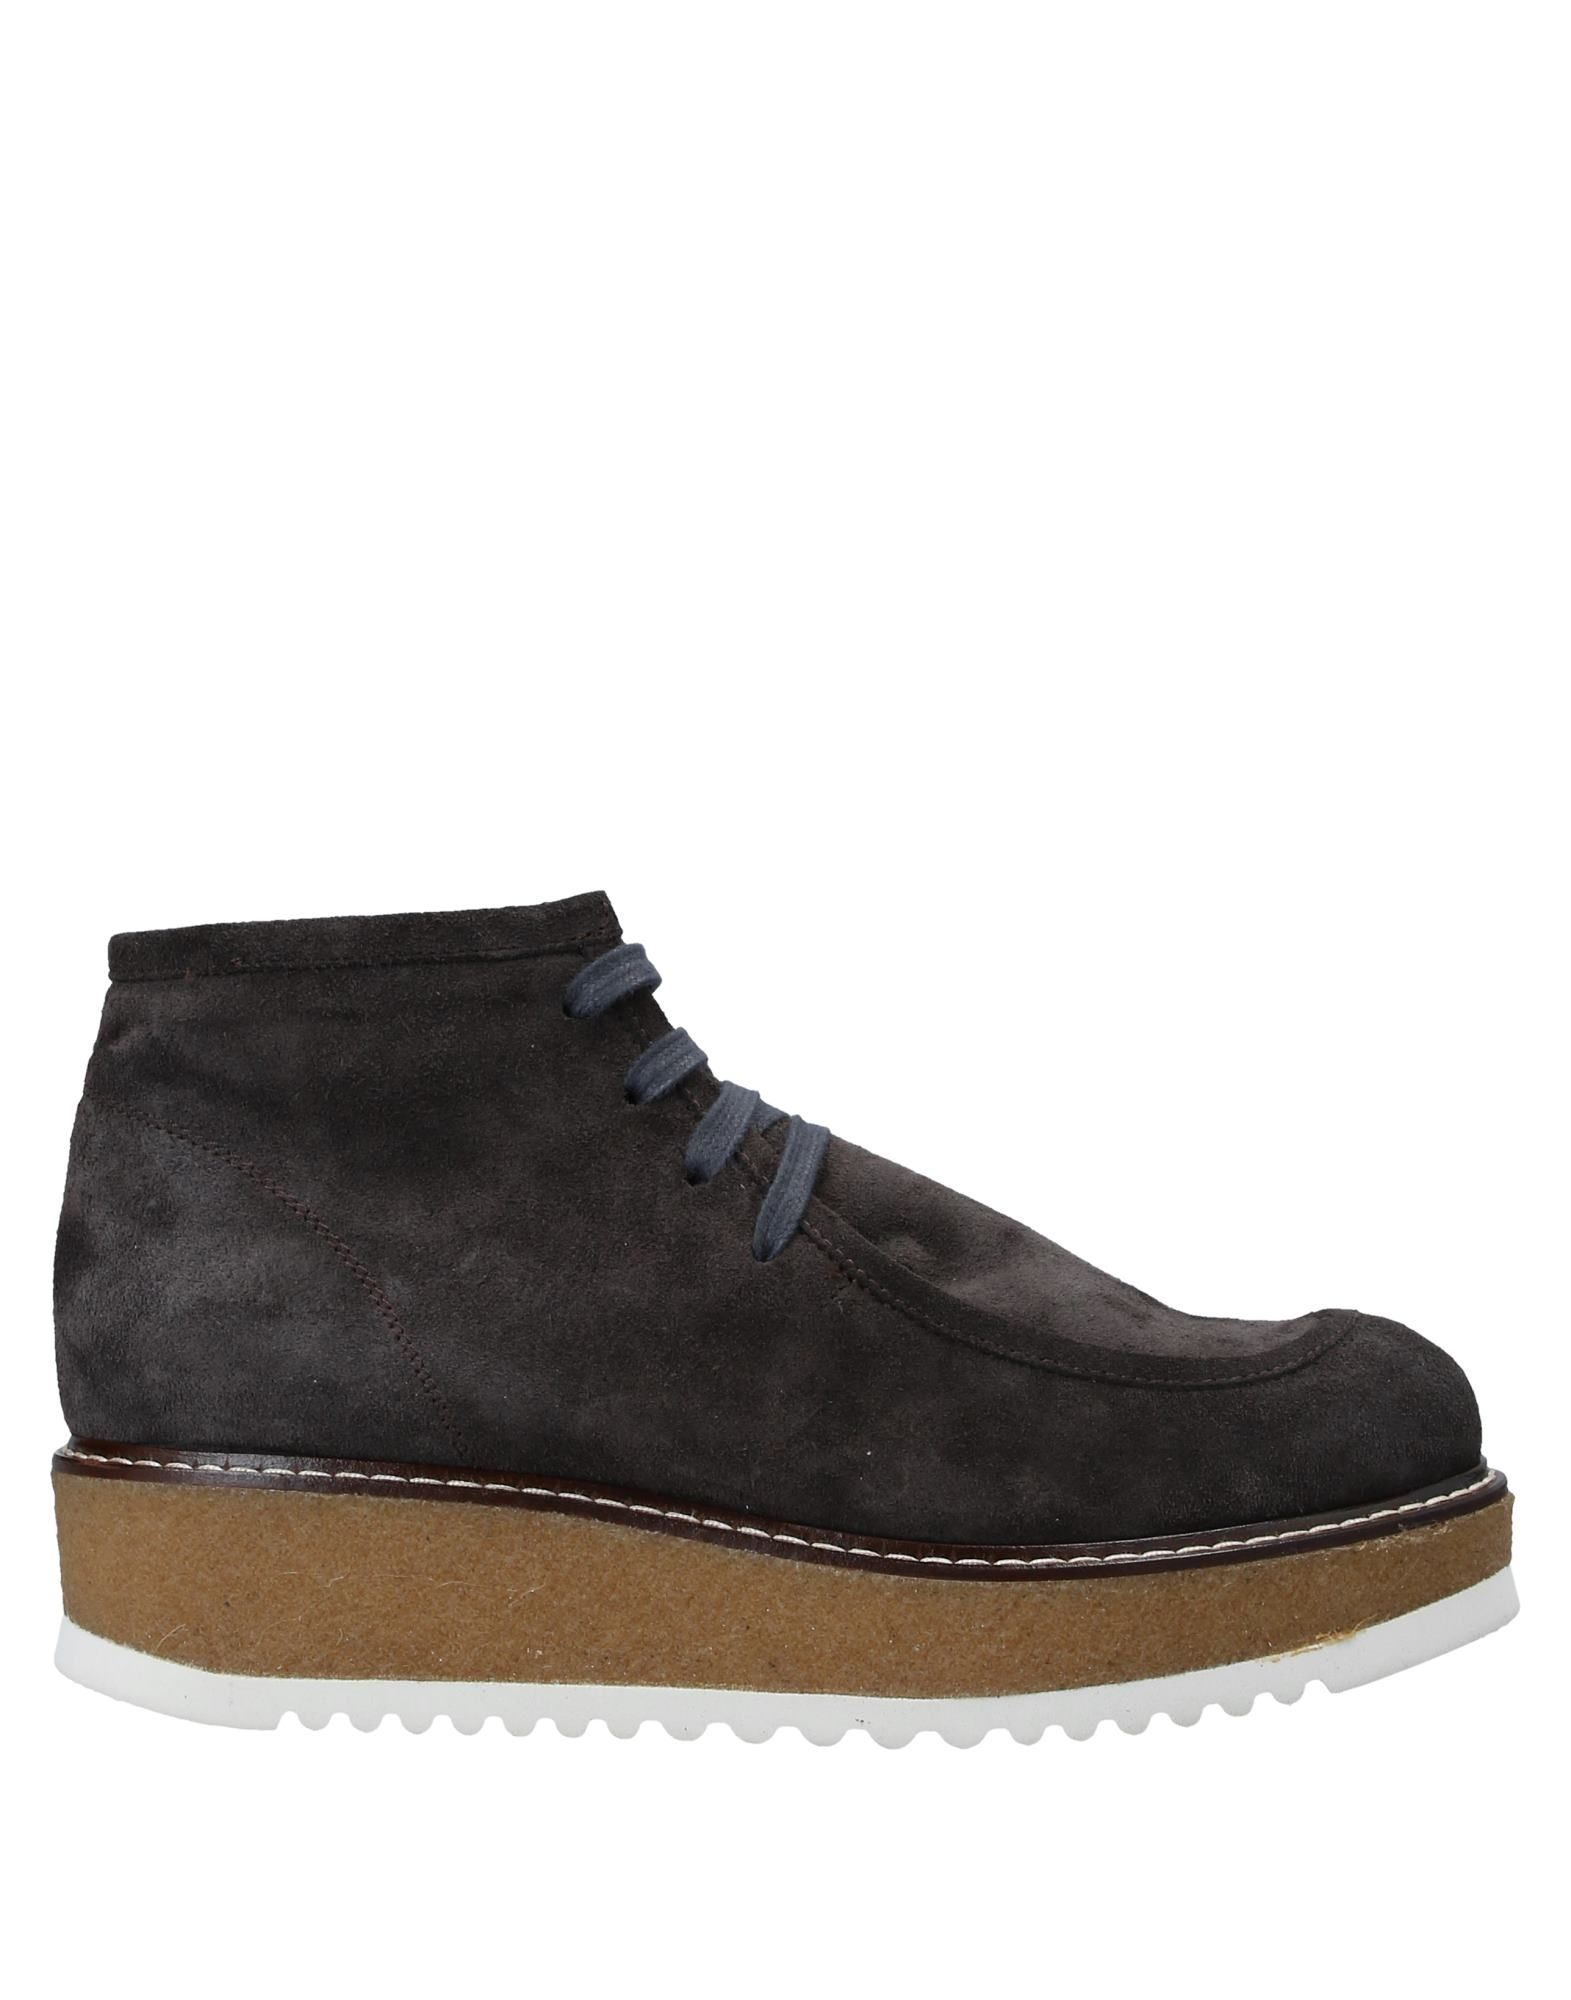 WEEKEND MAX MARA Полусапоги и высокие ботинки